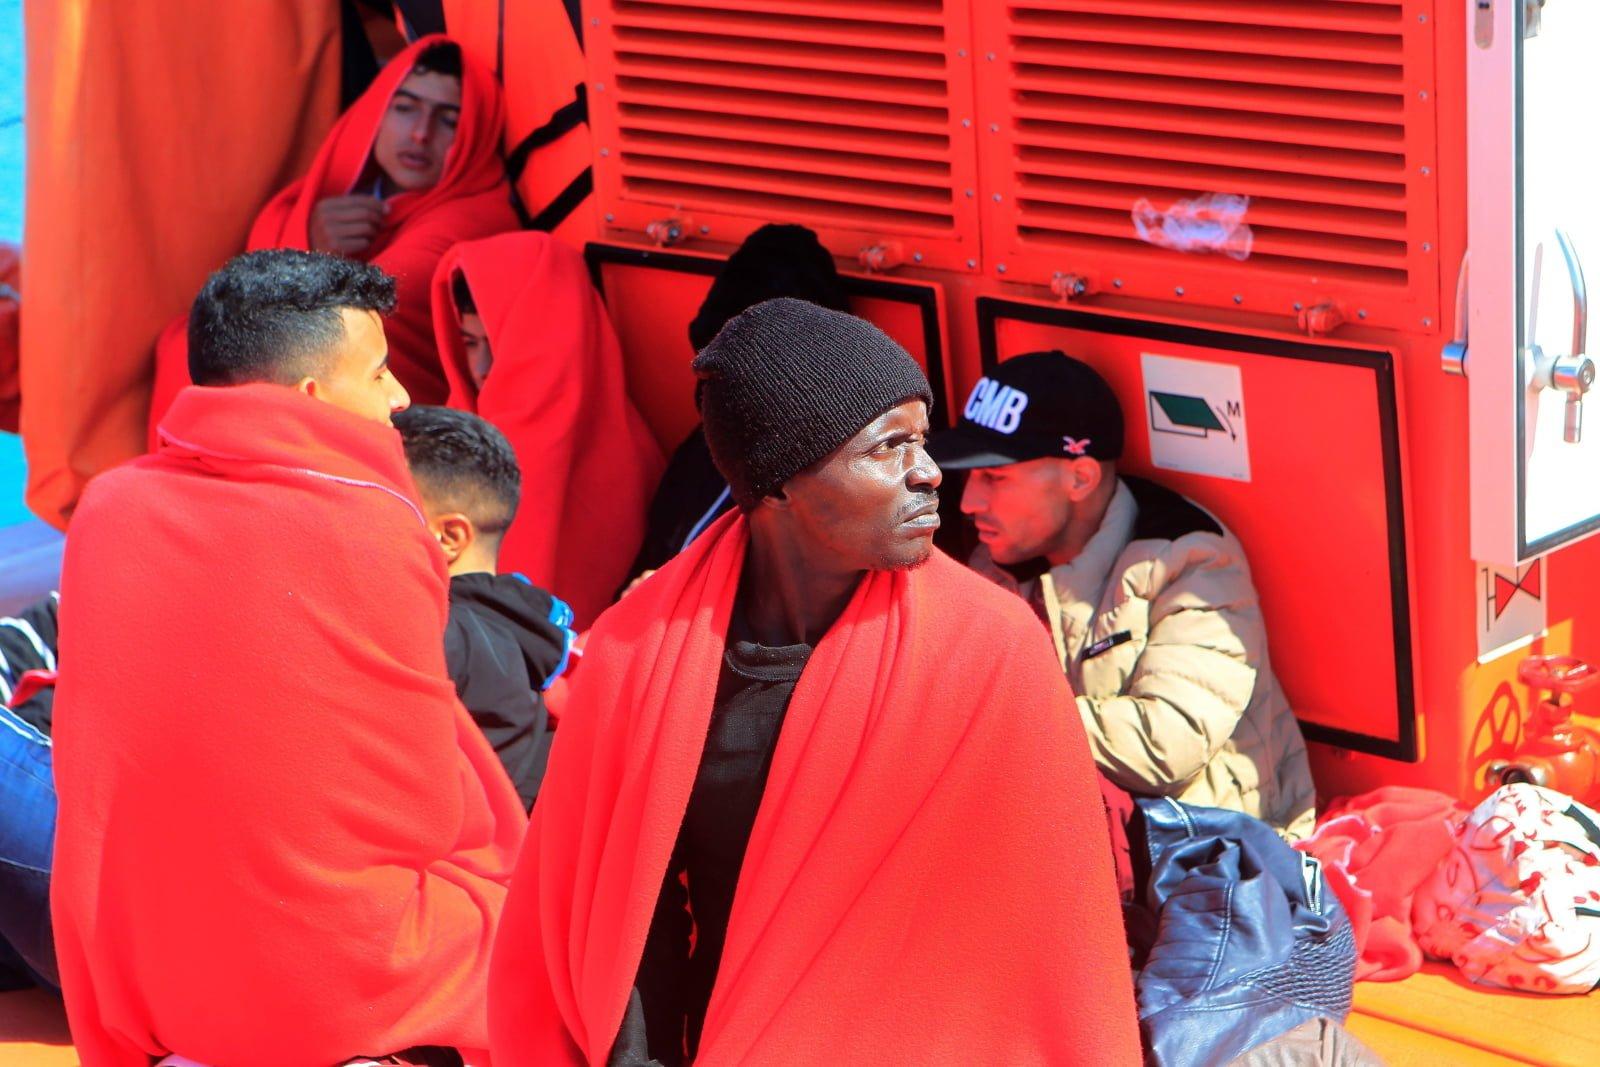 Migranci w Hiszpanii fot. EPA/A. CARRASCO RAGEL